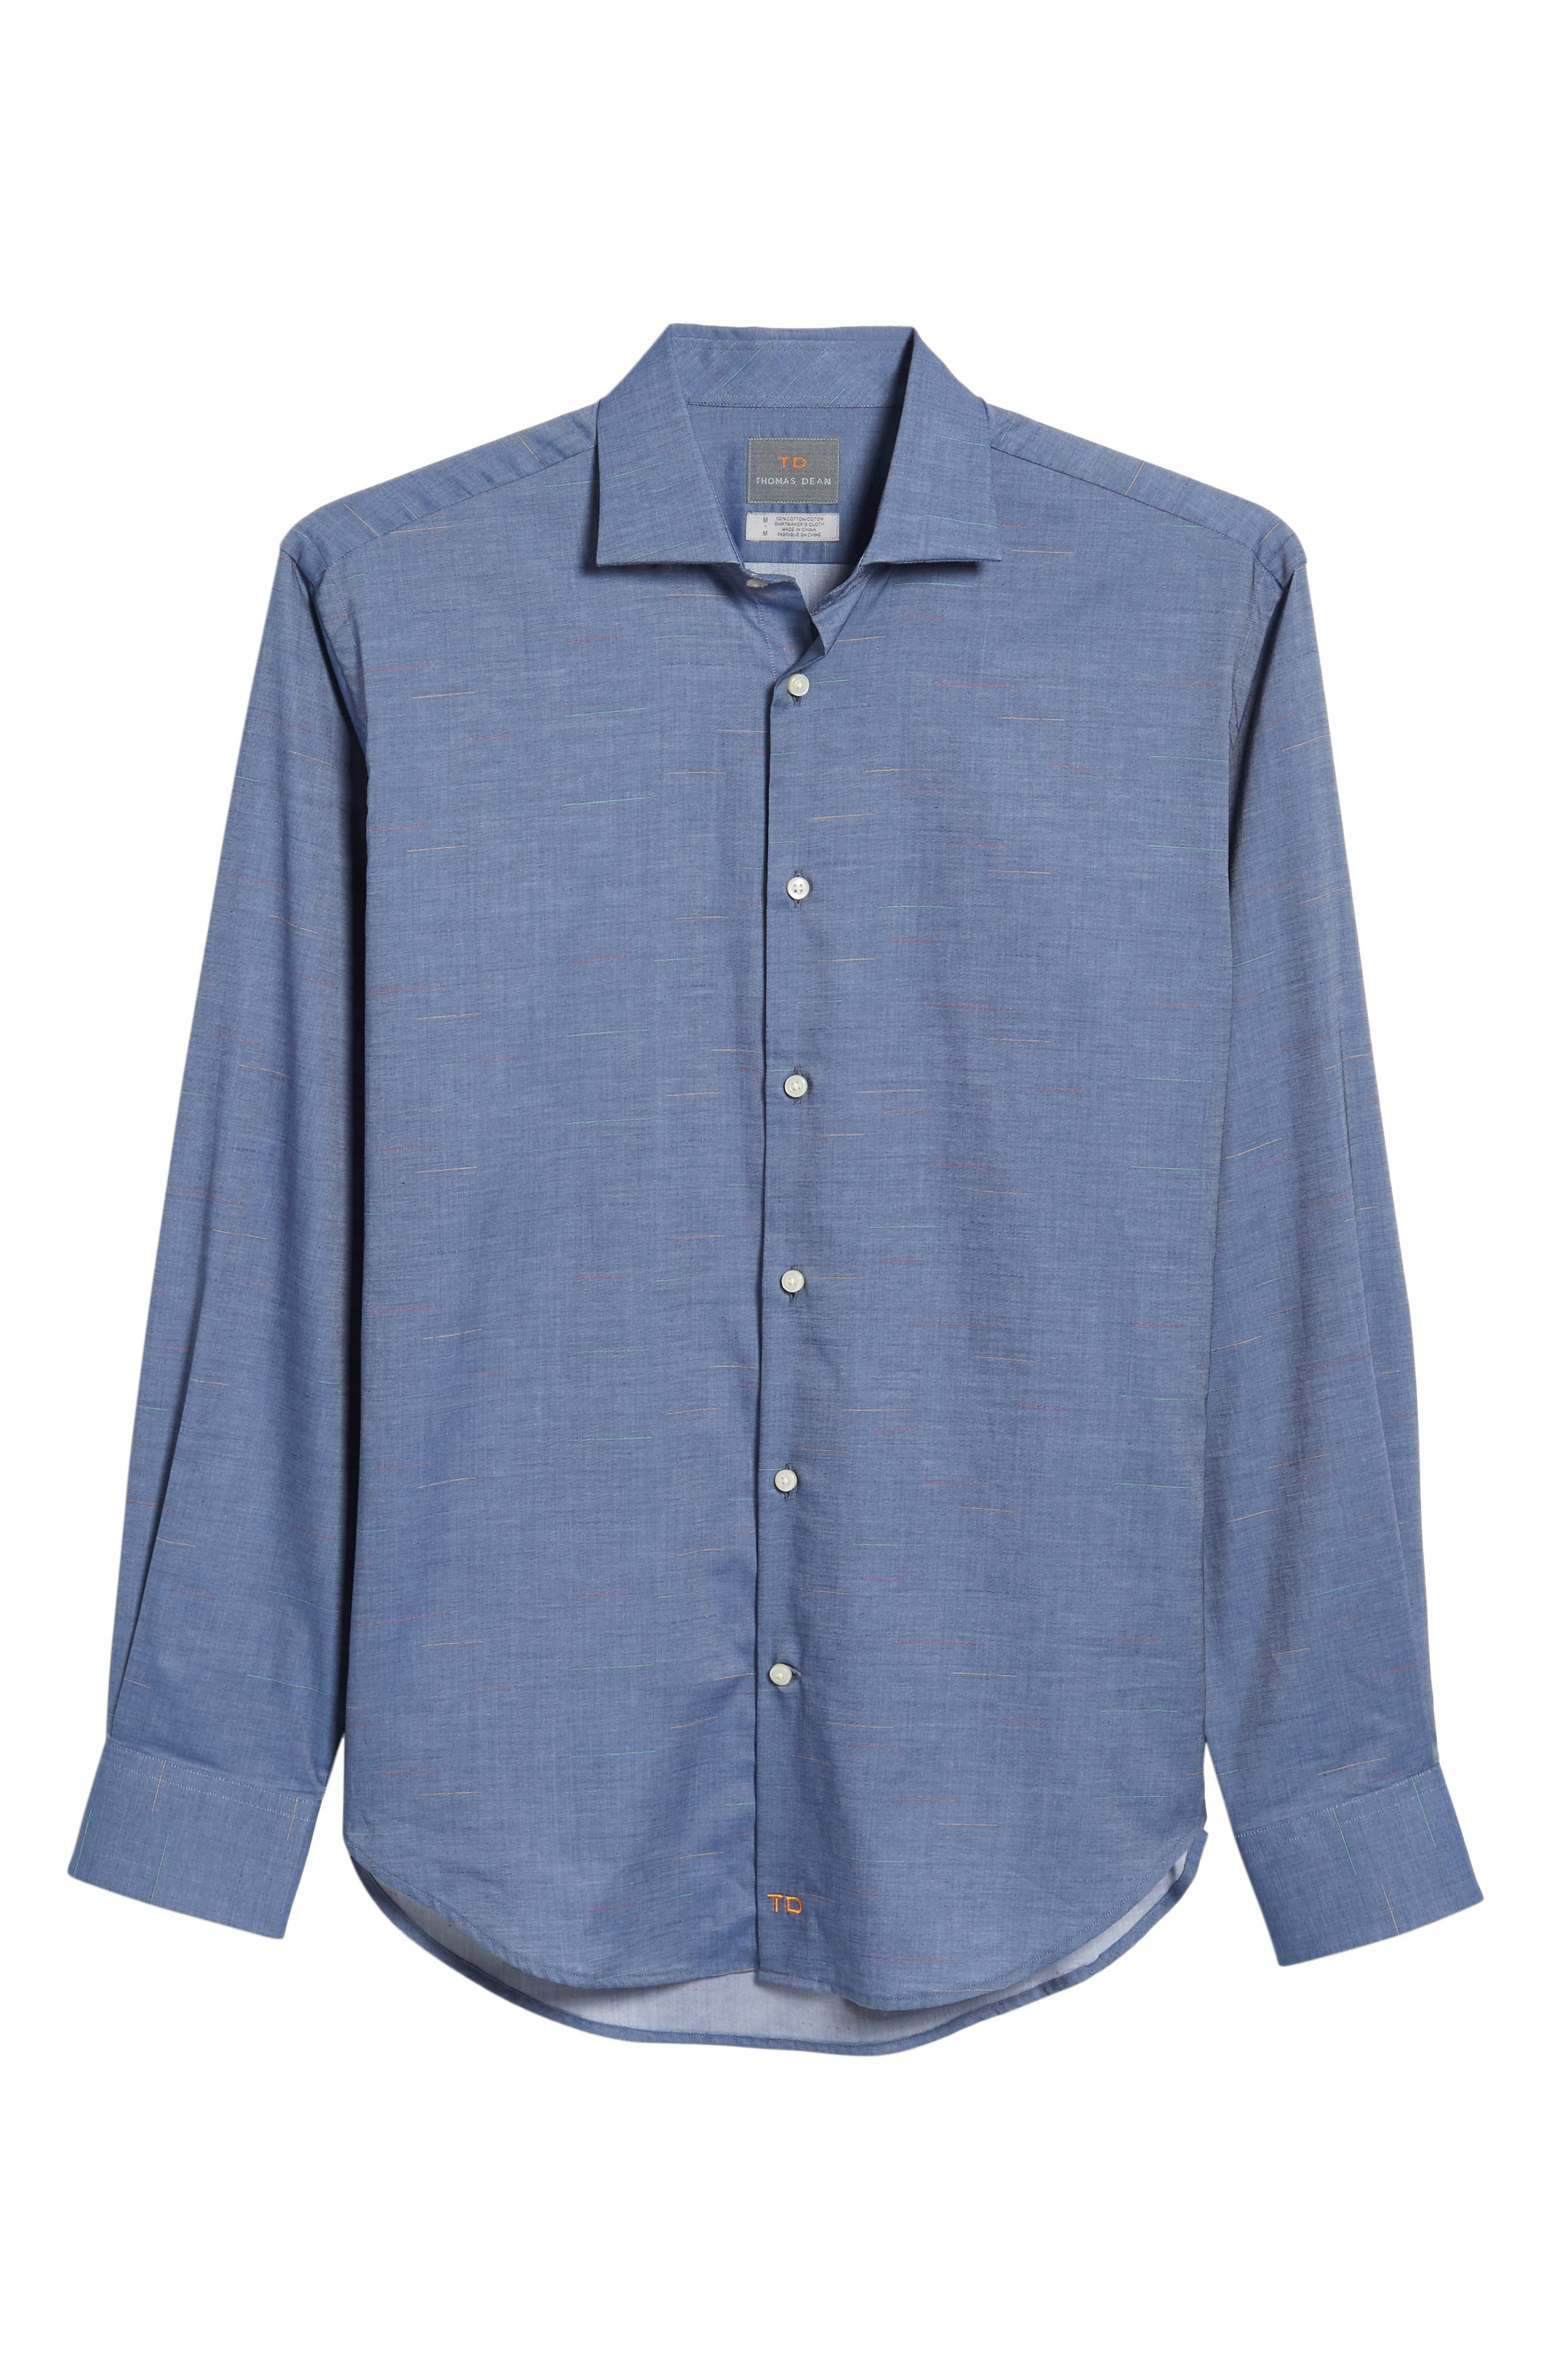 Regular Fit Chambray Sport Shirt,                             Alternate thumbnail 6, color,                             400